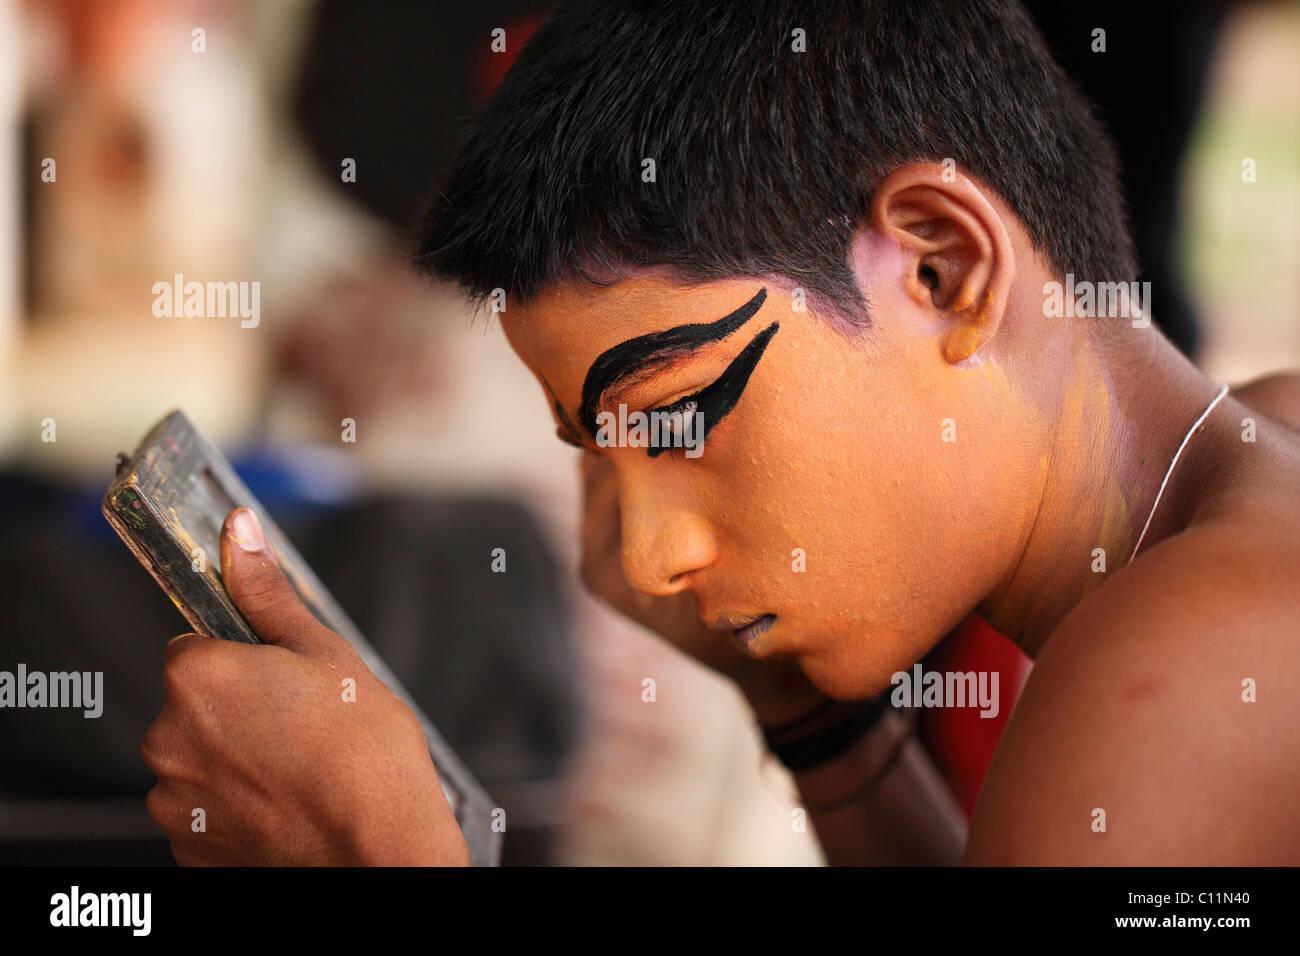 Kathakali dancer doing his make up, Minukku character, Kerala, southern India, Asia - Stock Image